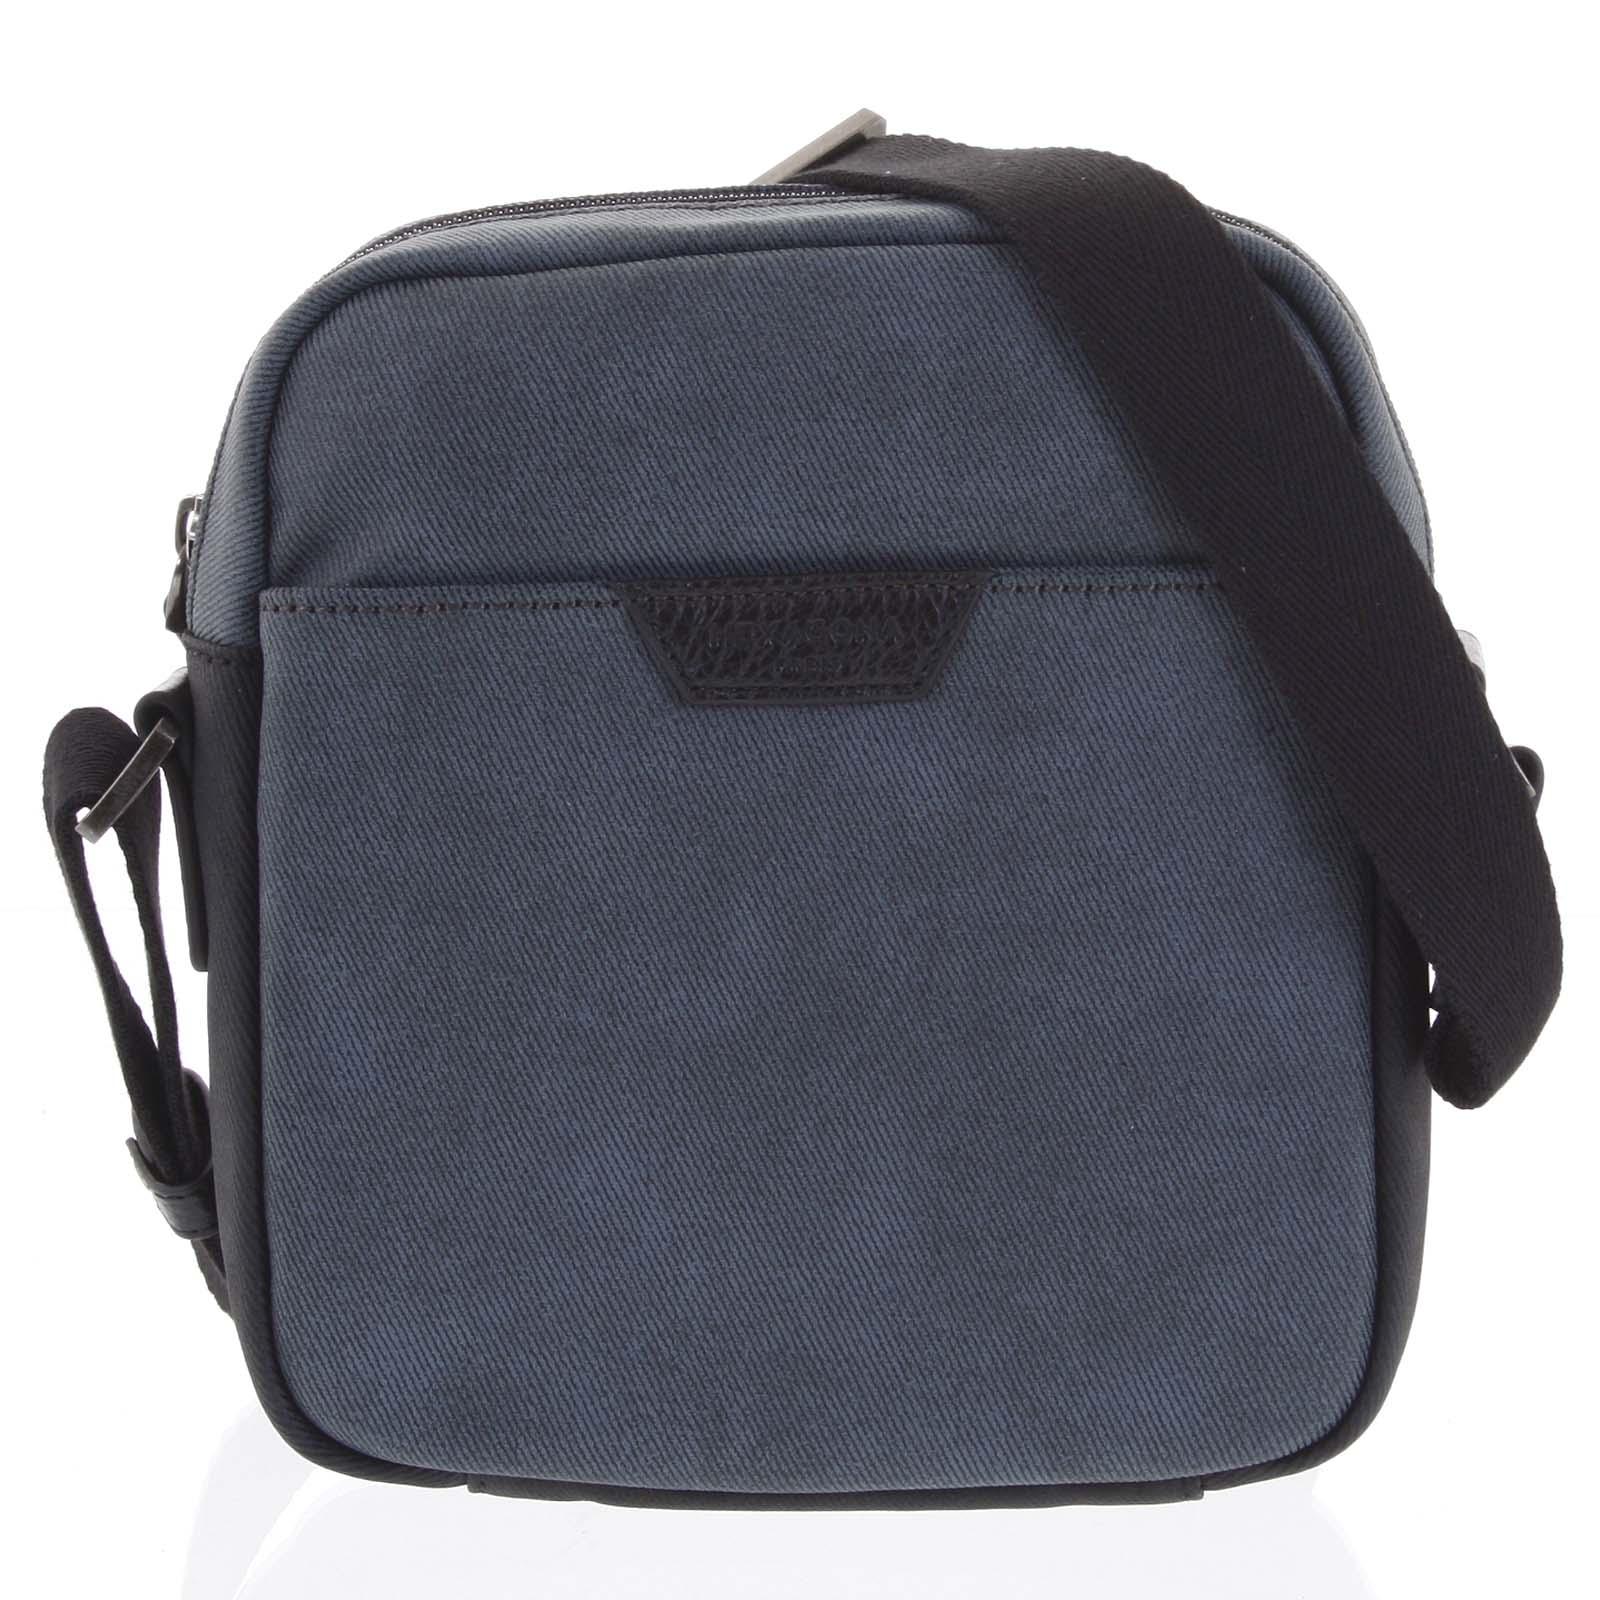 Pánska taška cez plece modrá - Hexagona Clark modrá